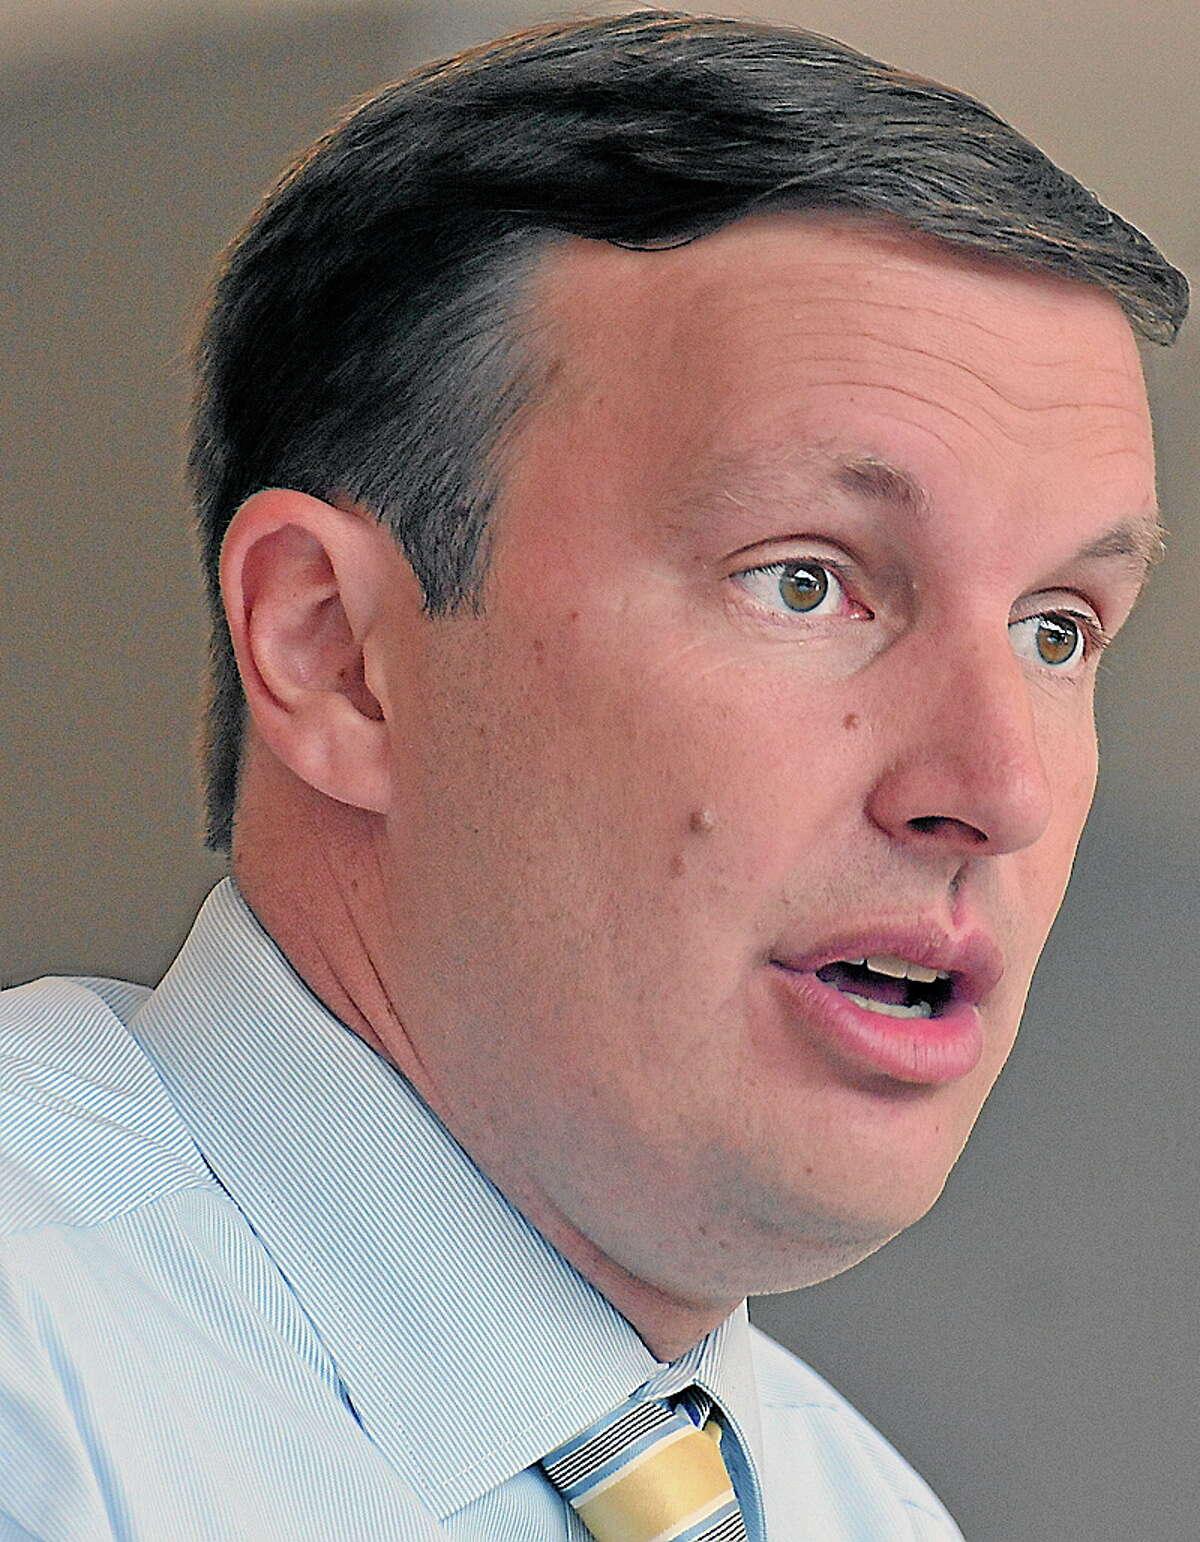 File photo: U.S. Sen. Chris Murphy, D-Conn